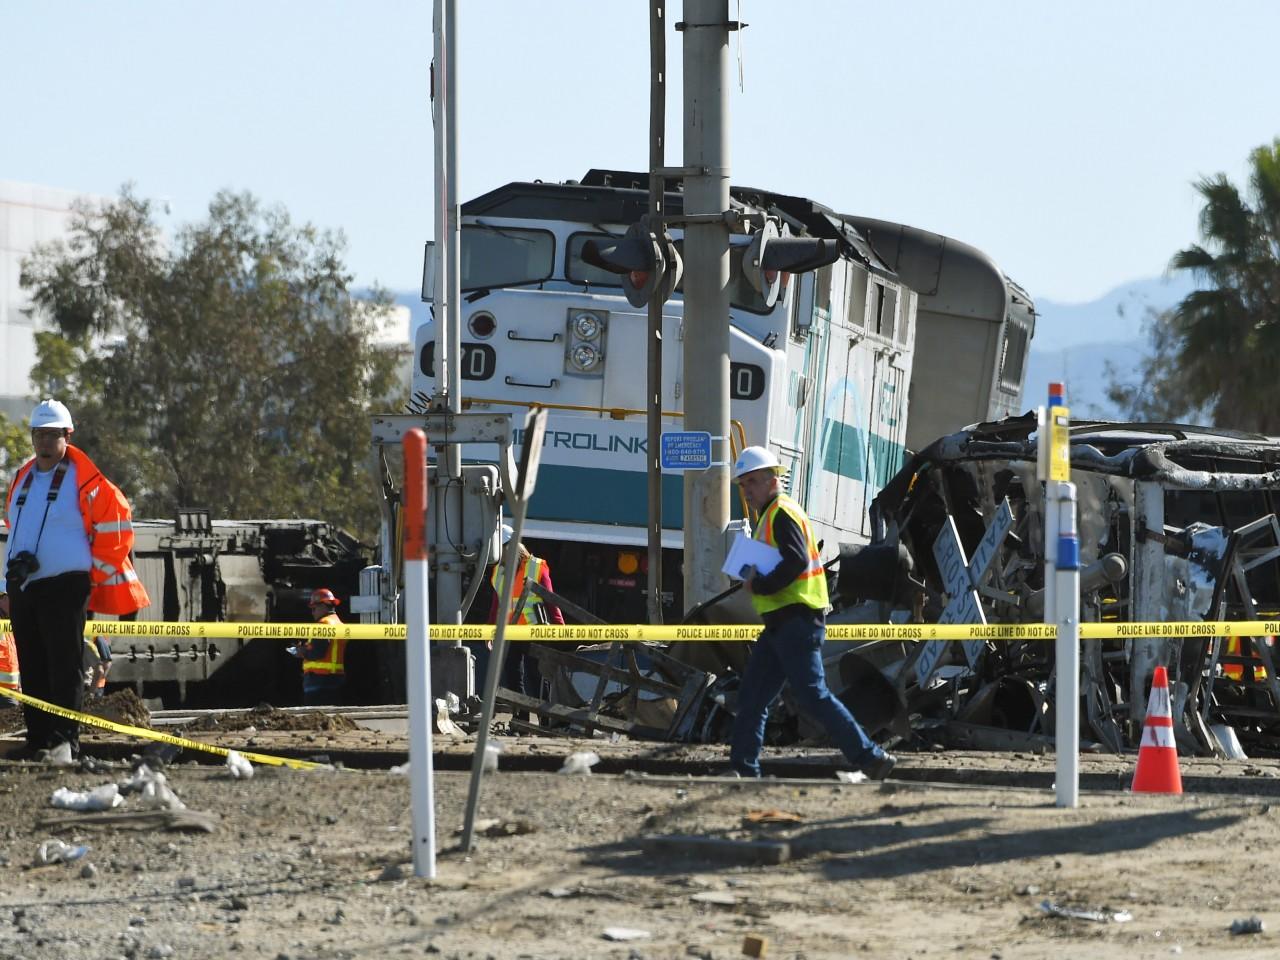 Feds  Truck driver in train crash wasn   t stuck on tracks - Salon comTrain Crash Truck